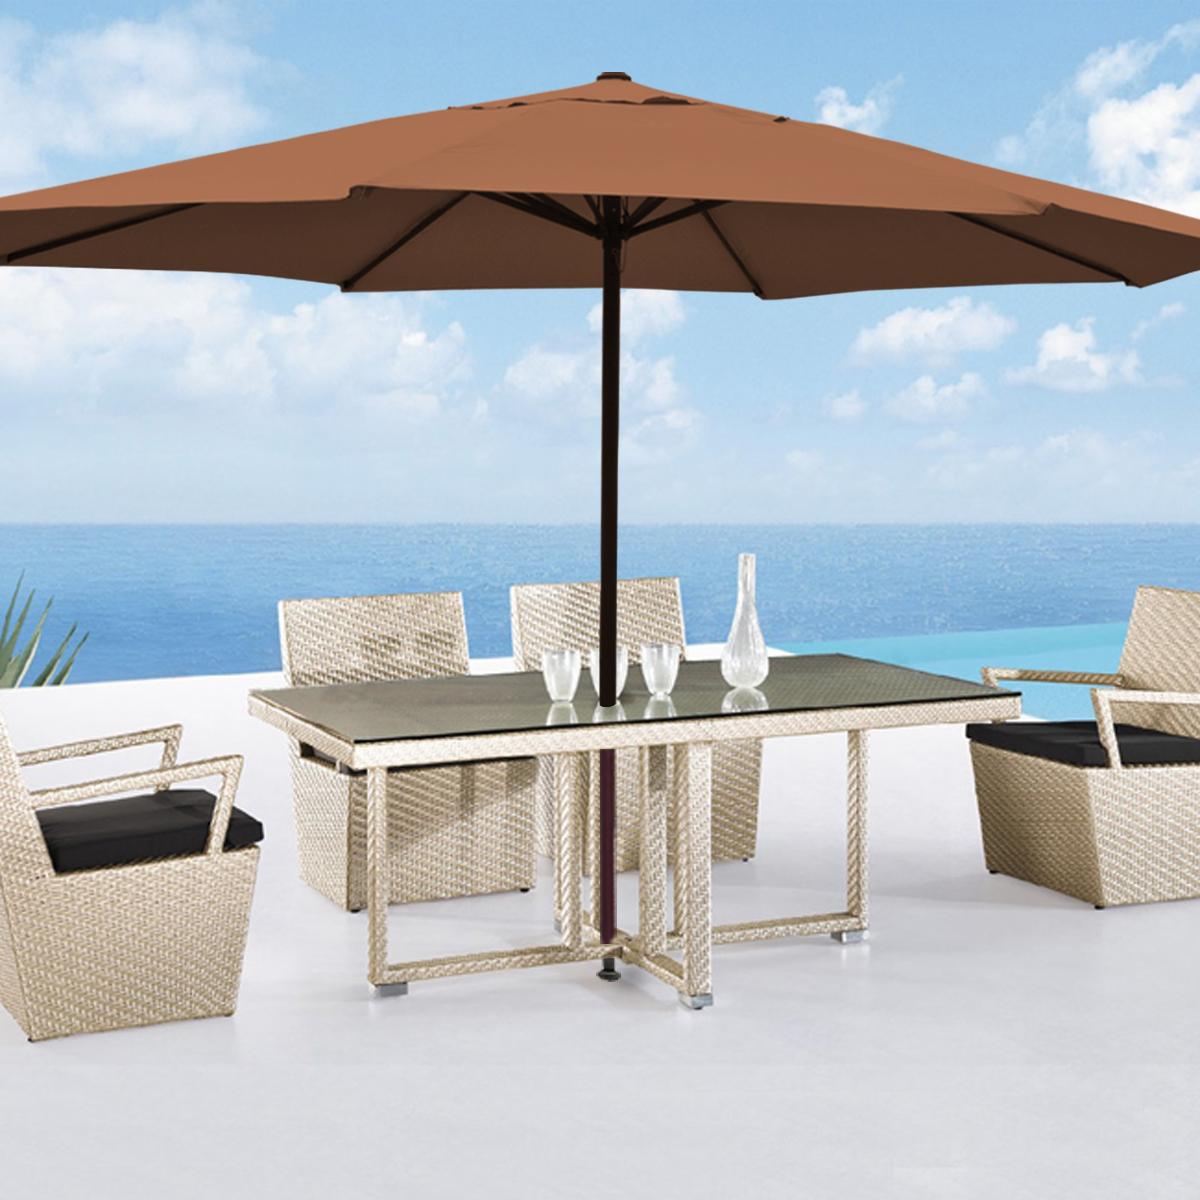 13 039 ft feet outdoor large patio umbrella tent deck gazebo sun shade